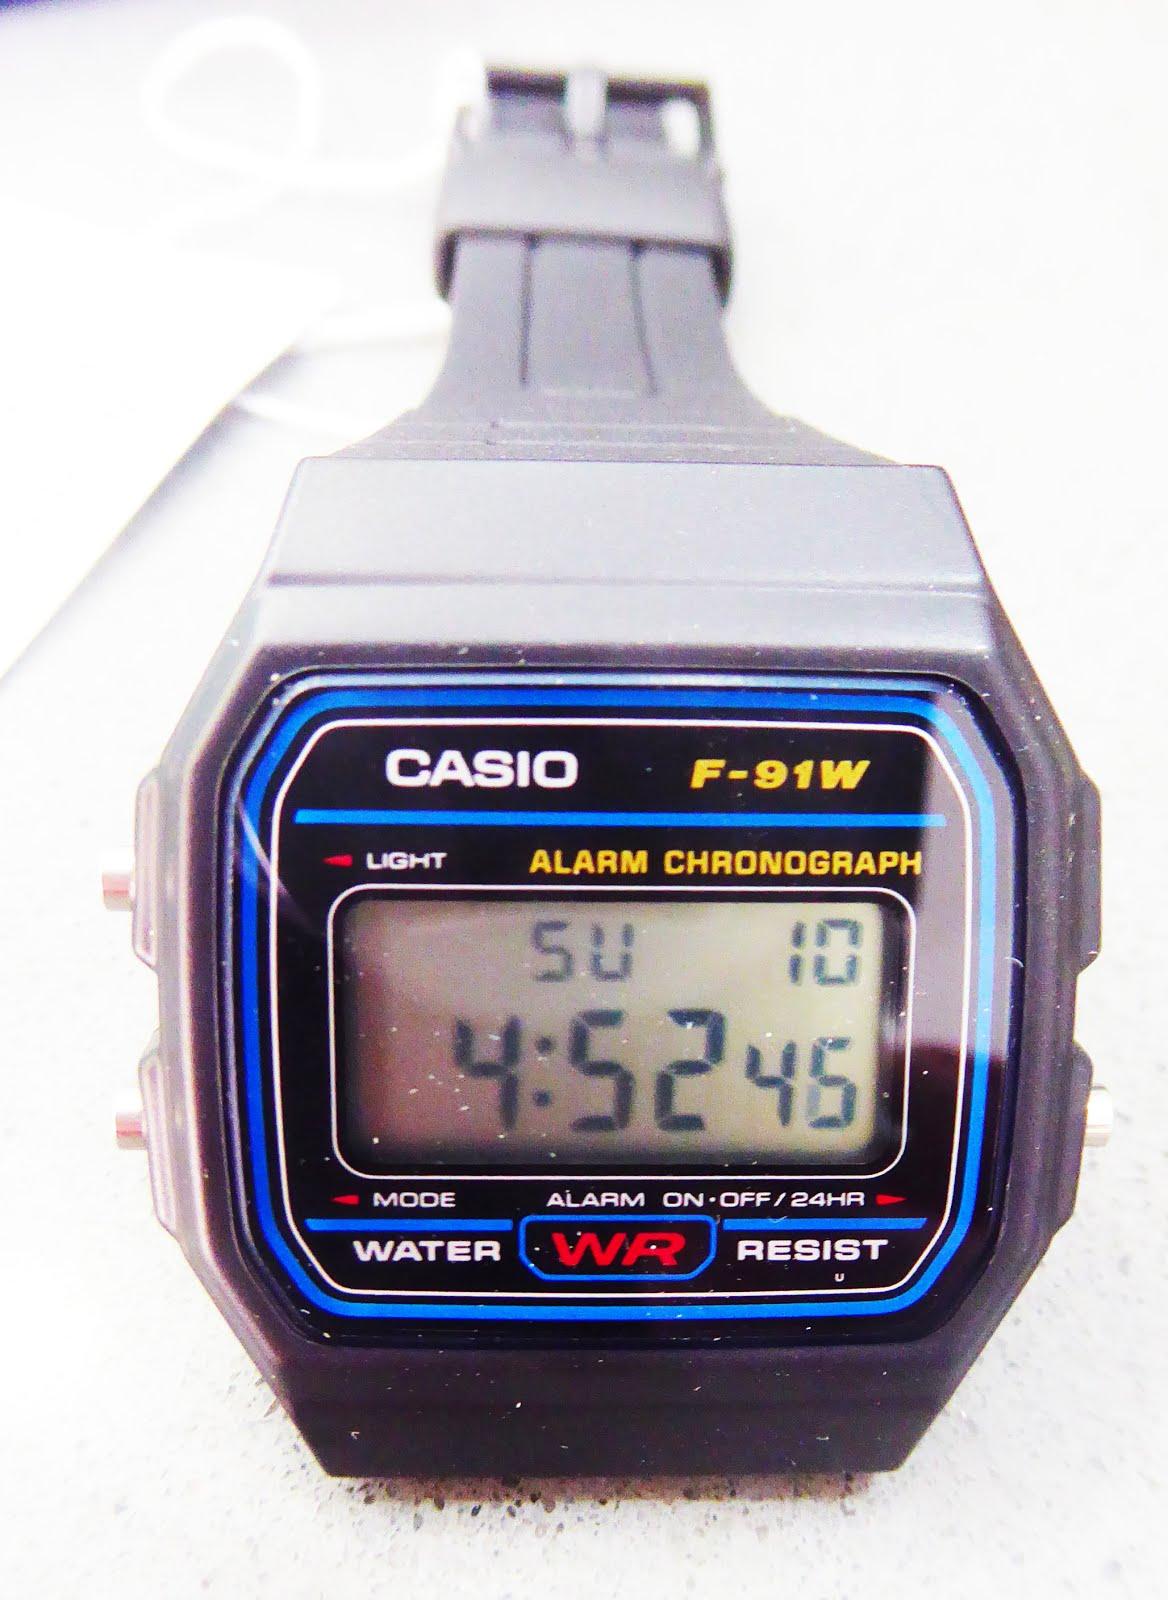 Clásicos Populares, reloj digital Casio